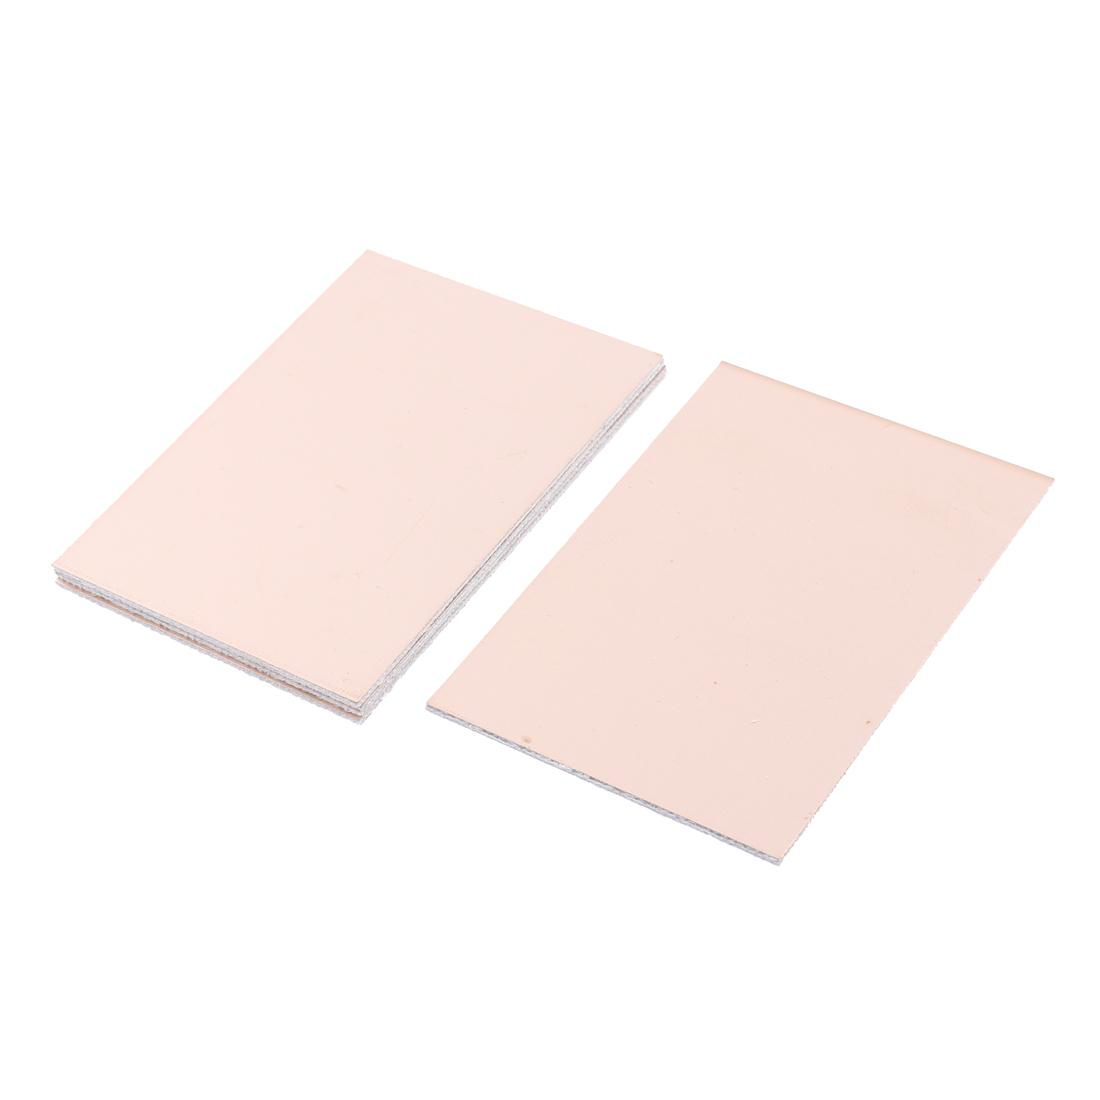 5 Pcs FR-4 Copper Clad Single Side PCB Laminate Board 100mmx70mm 1.6mm